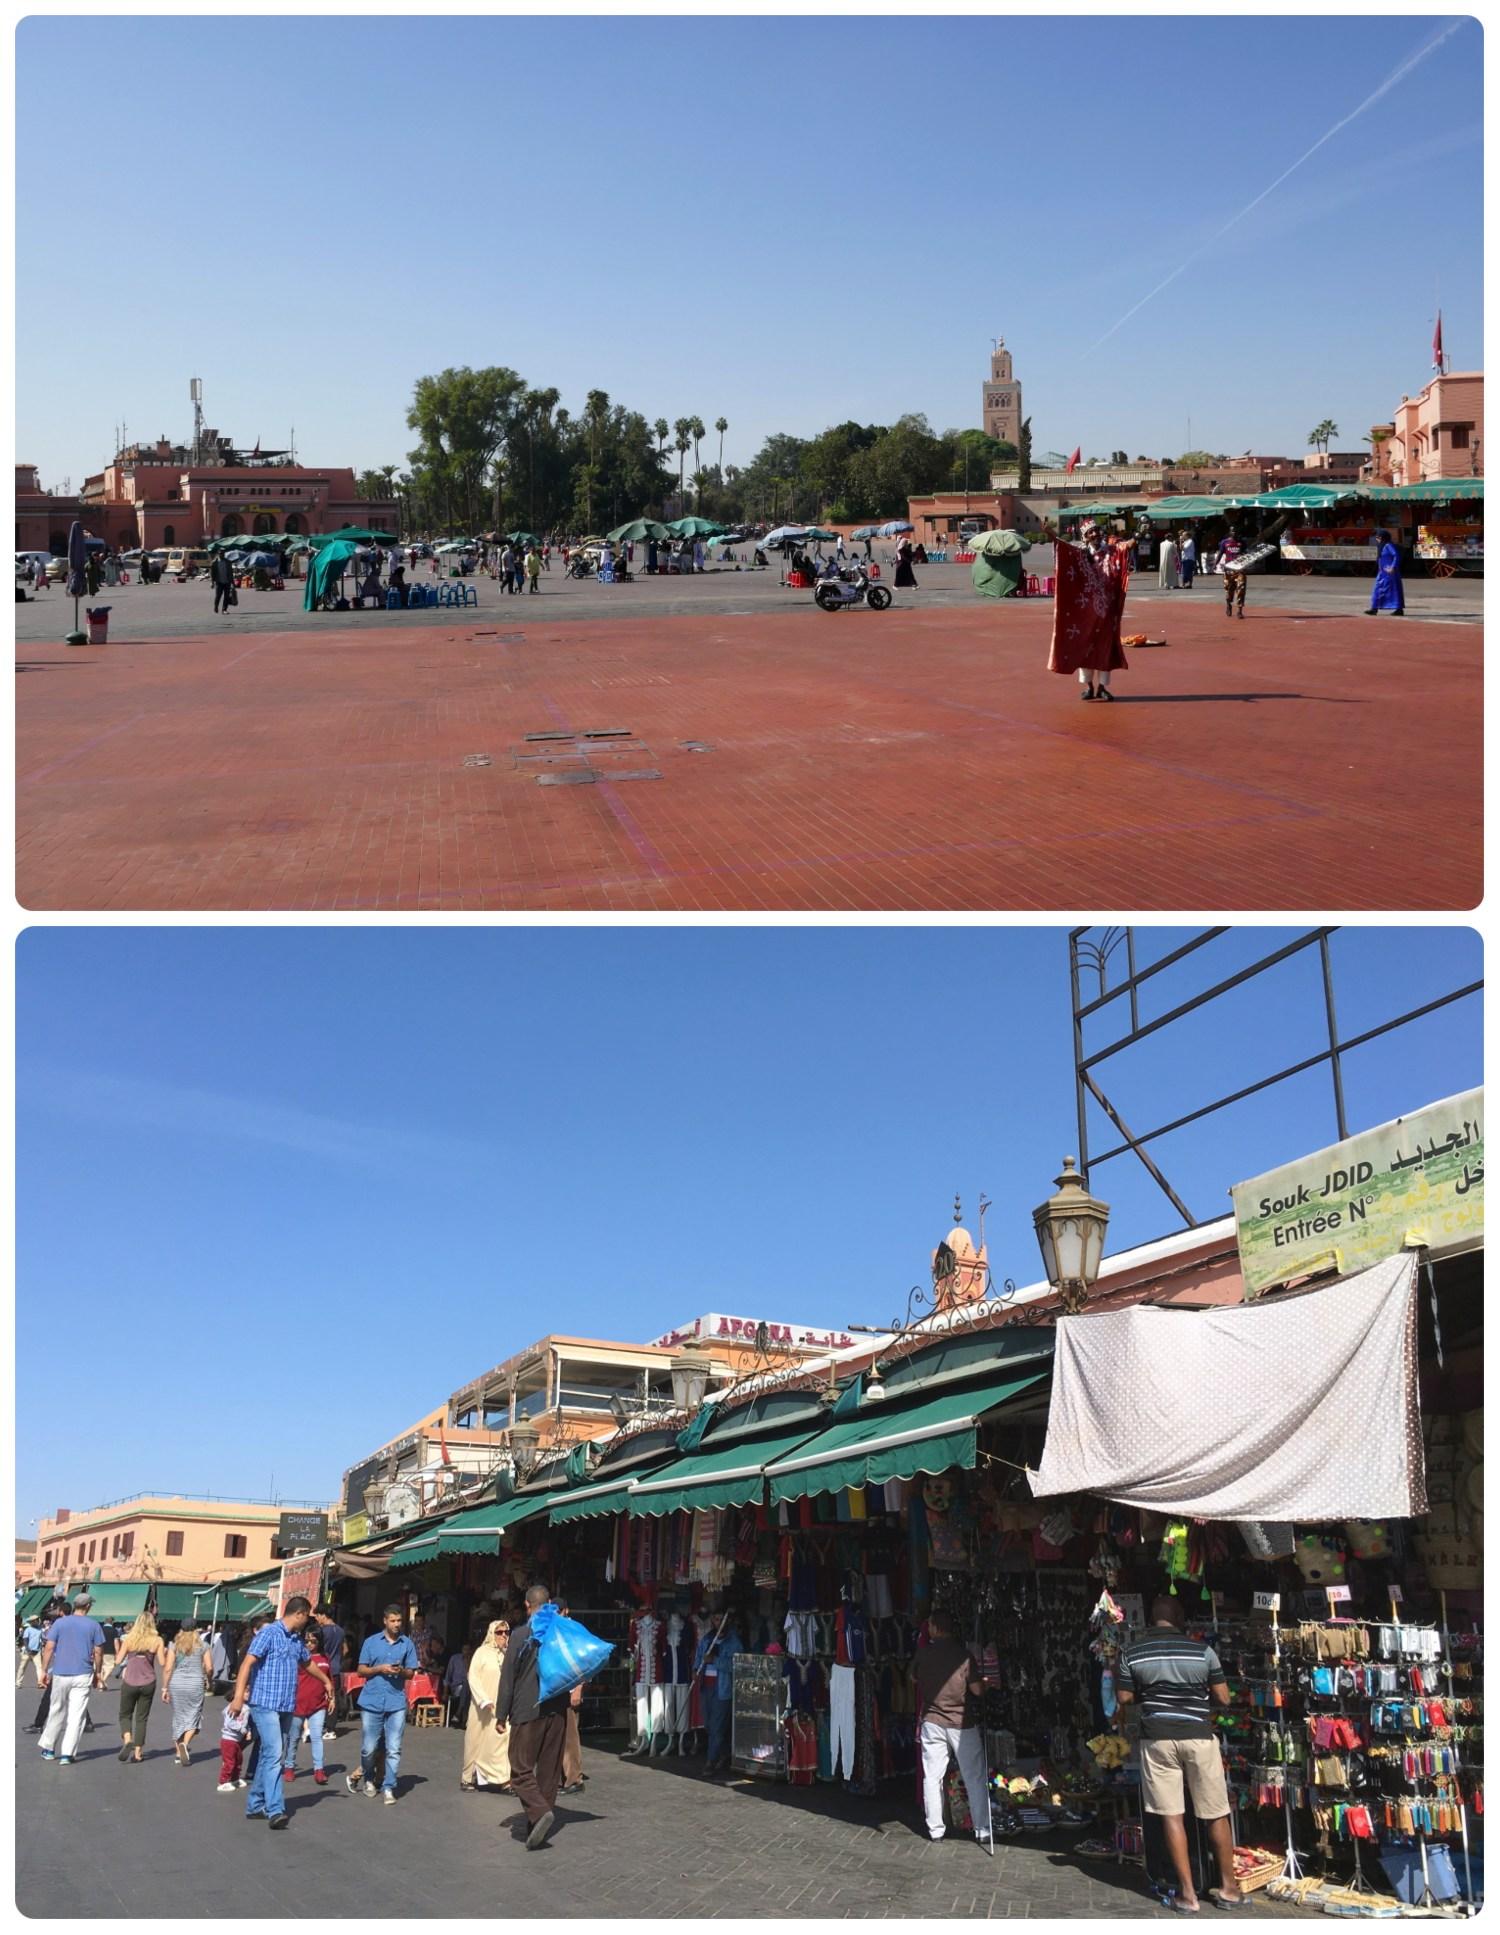 Jemaa el Fna Square in the Medina (Old Town), Marrakech, Morocco.